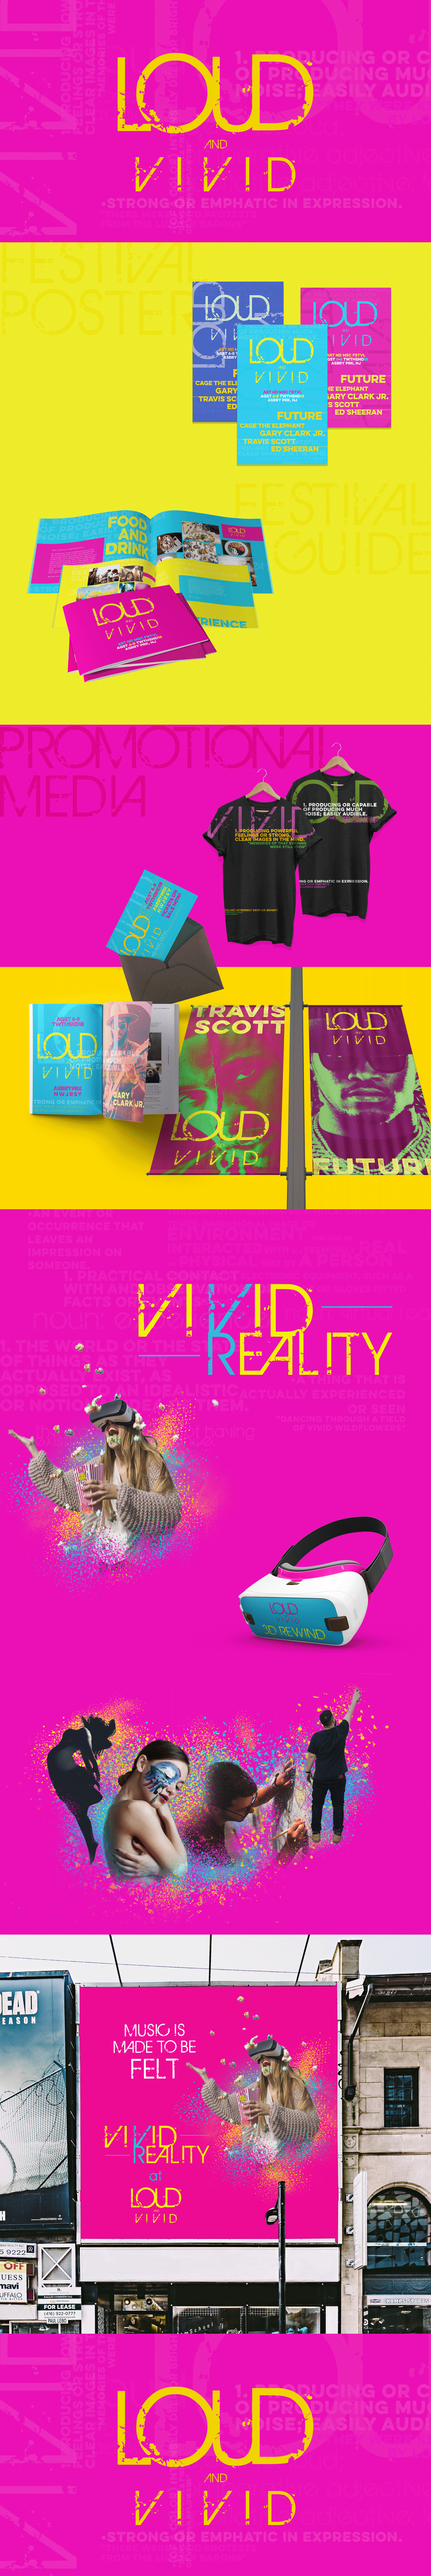 Loud_Vivid_PagesArtboard-1.png